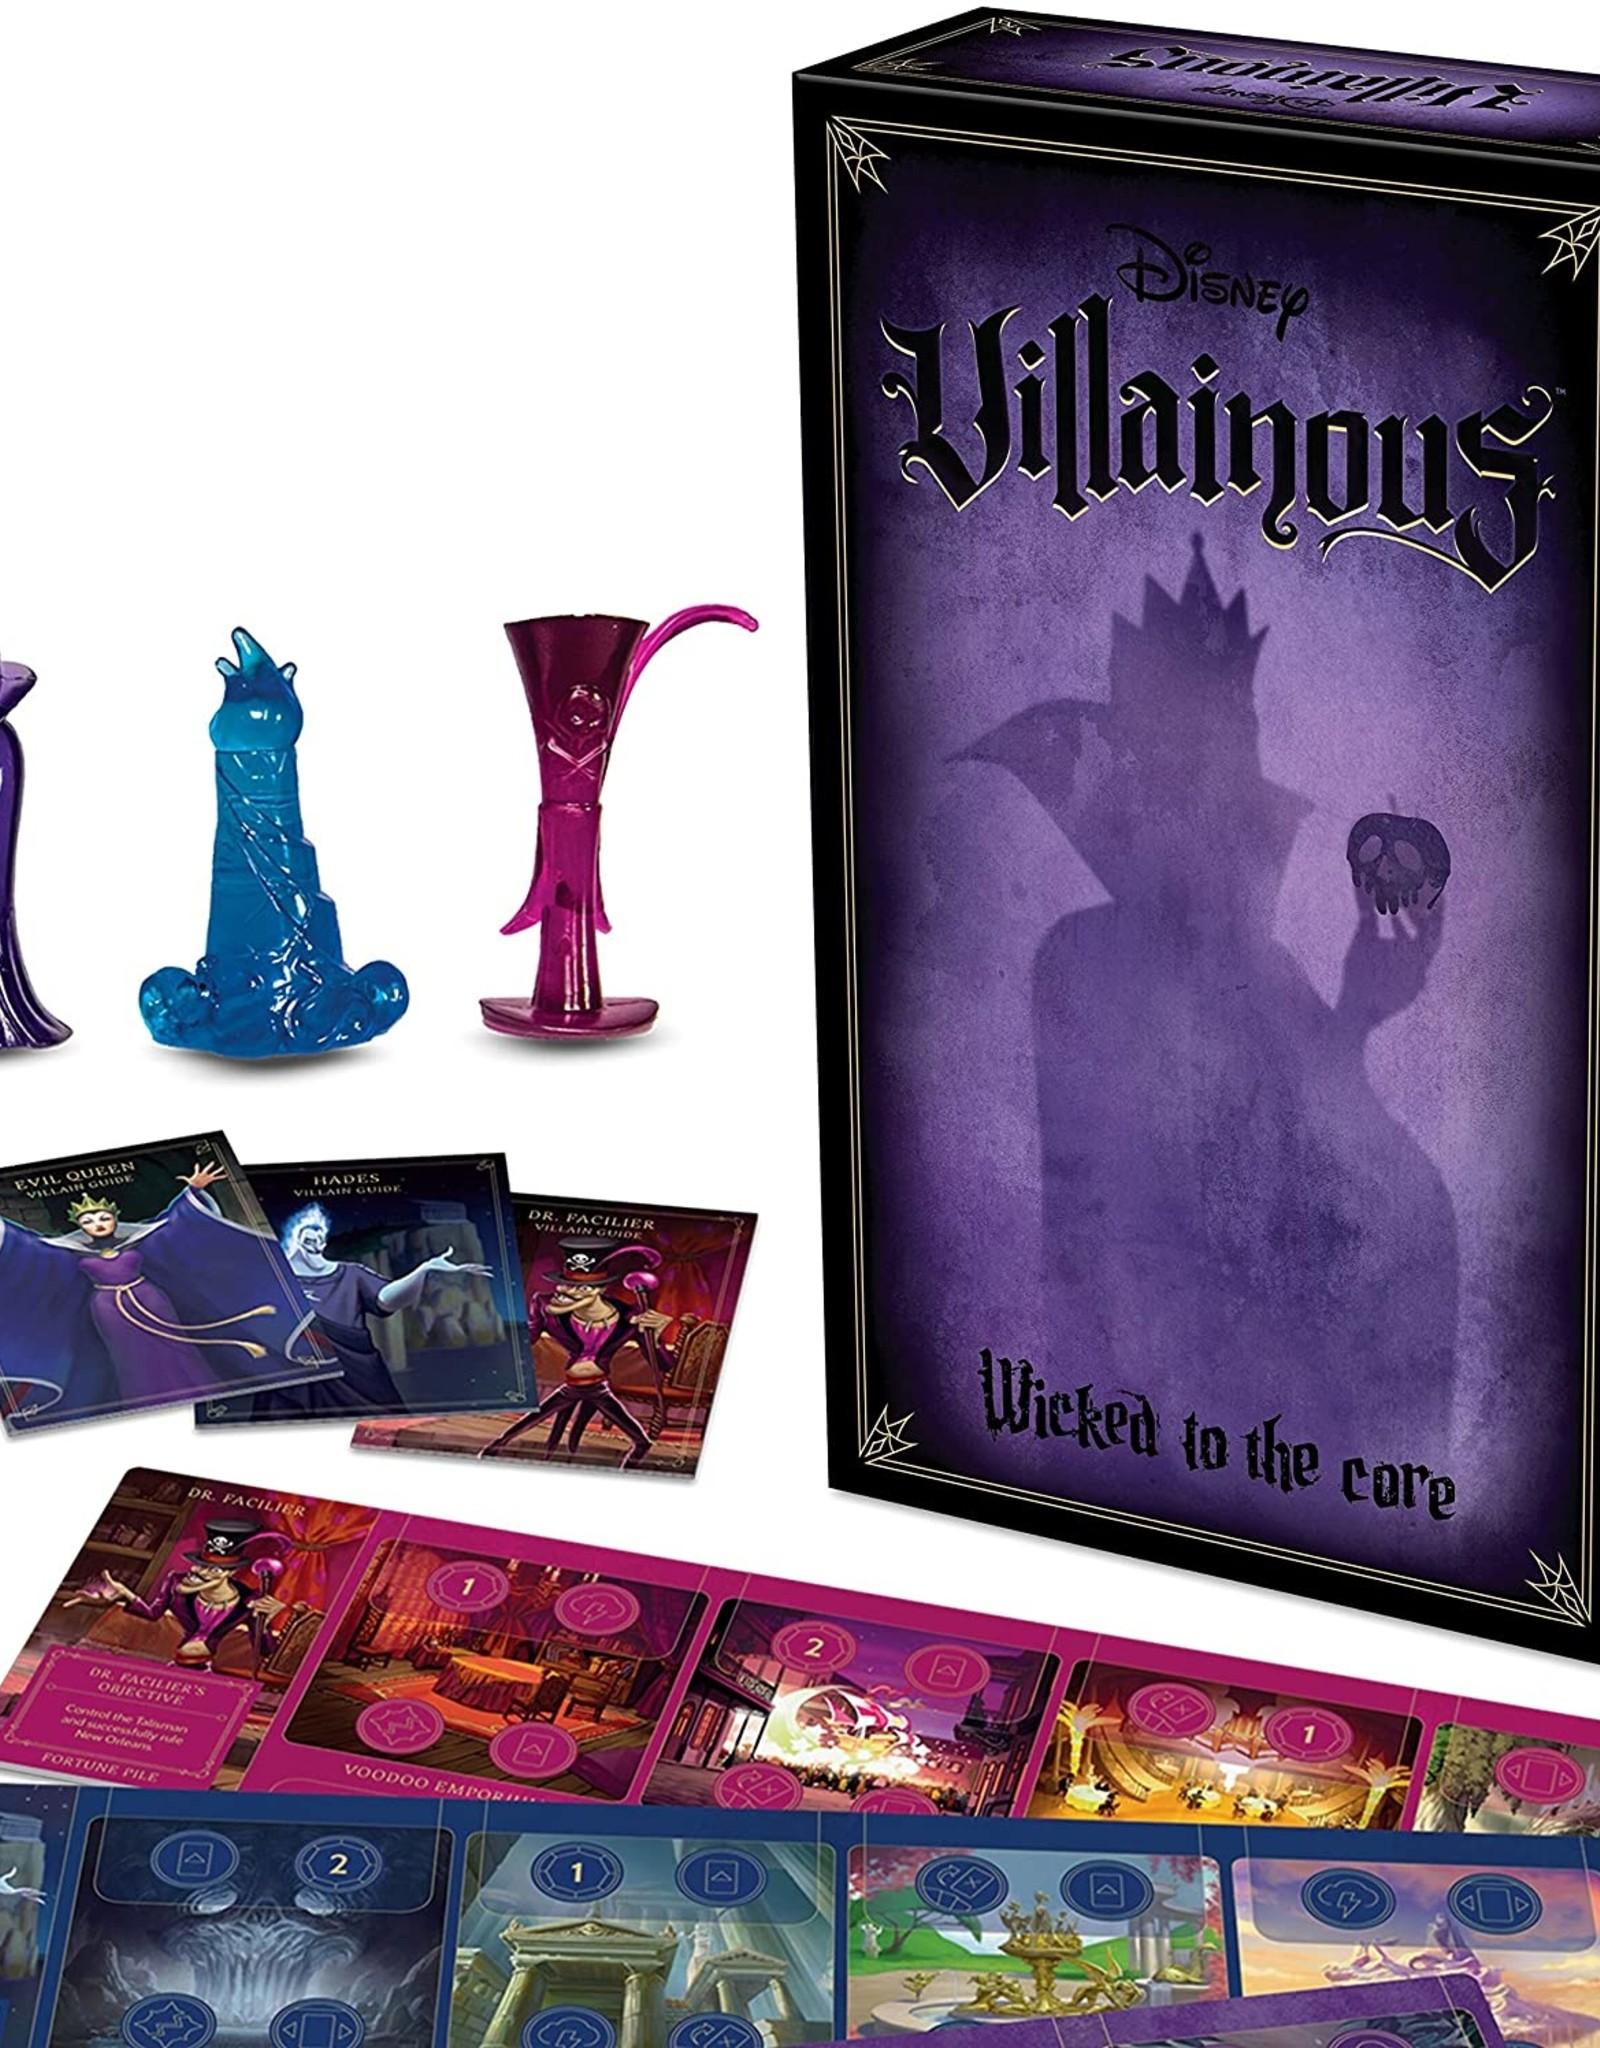 Ravensburger Villainous: Wicked to the Core